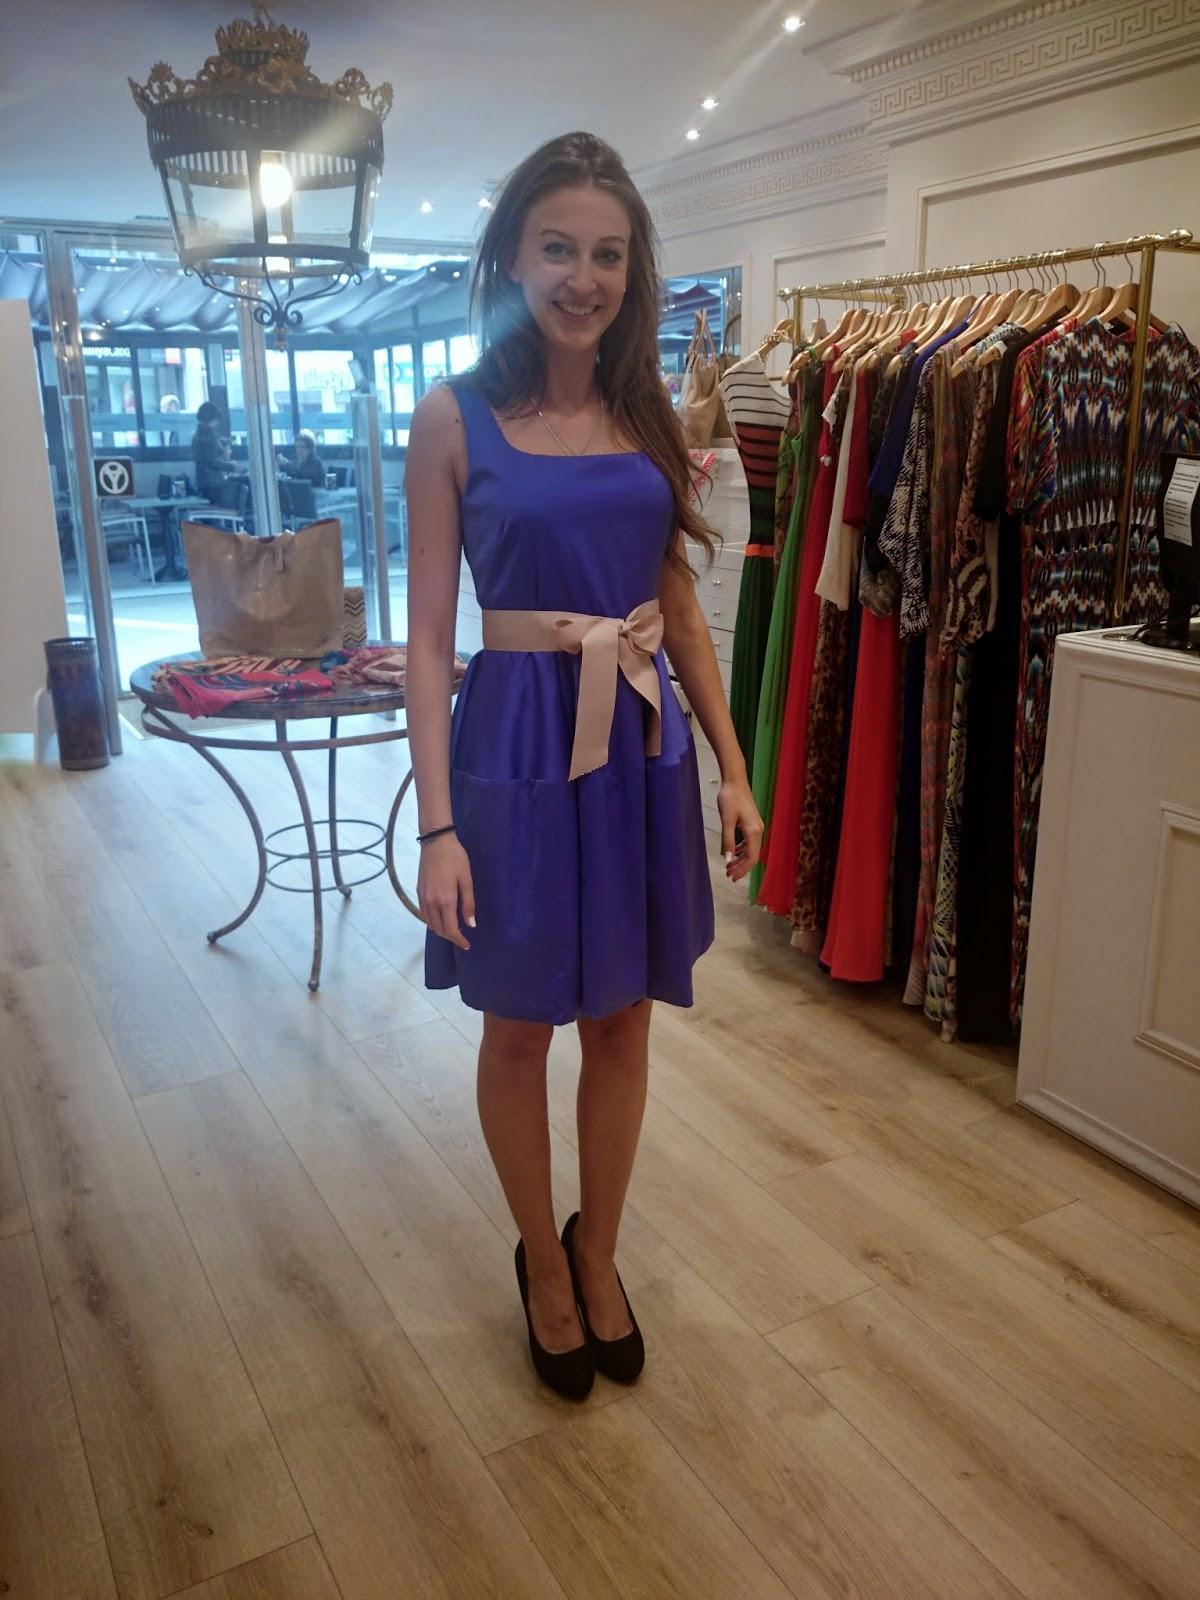 95b5e5d02 Vestidos de fiesta en gijon – Vestidos hermosos y de moda 2018